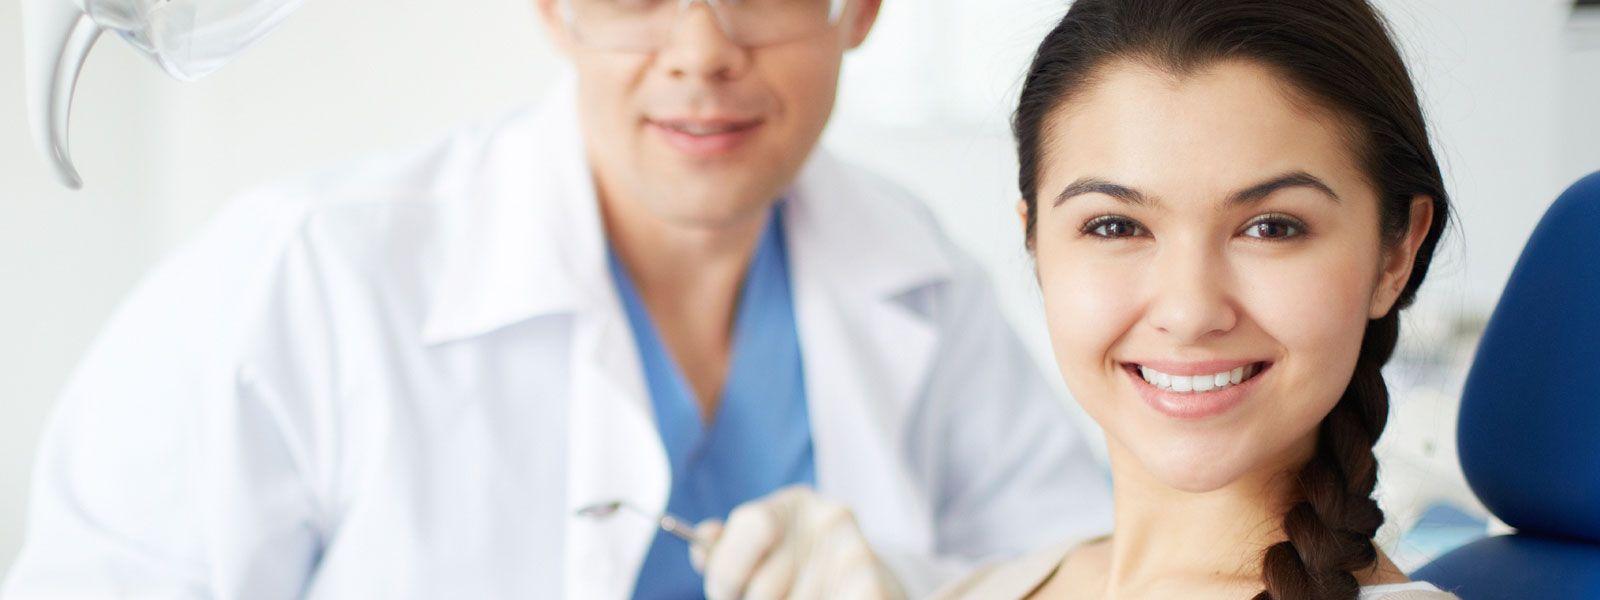 Emergency Dentist near me Emergency dental care, Dentist